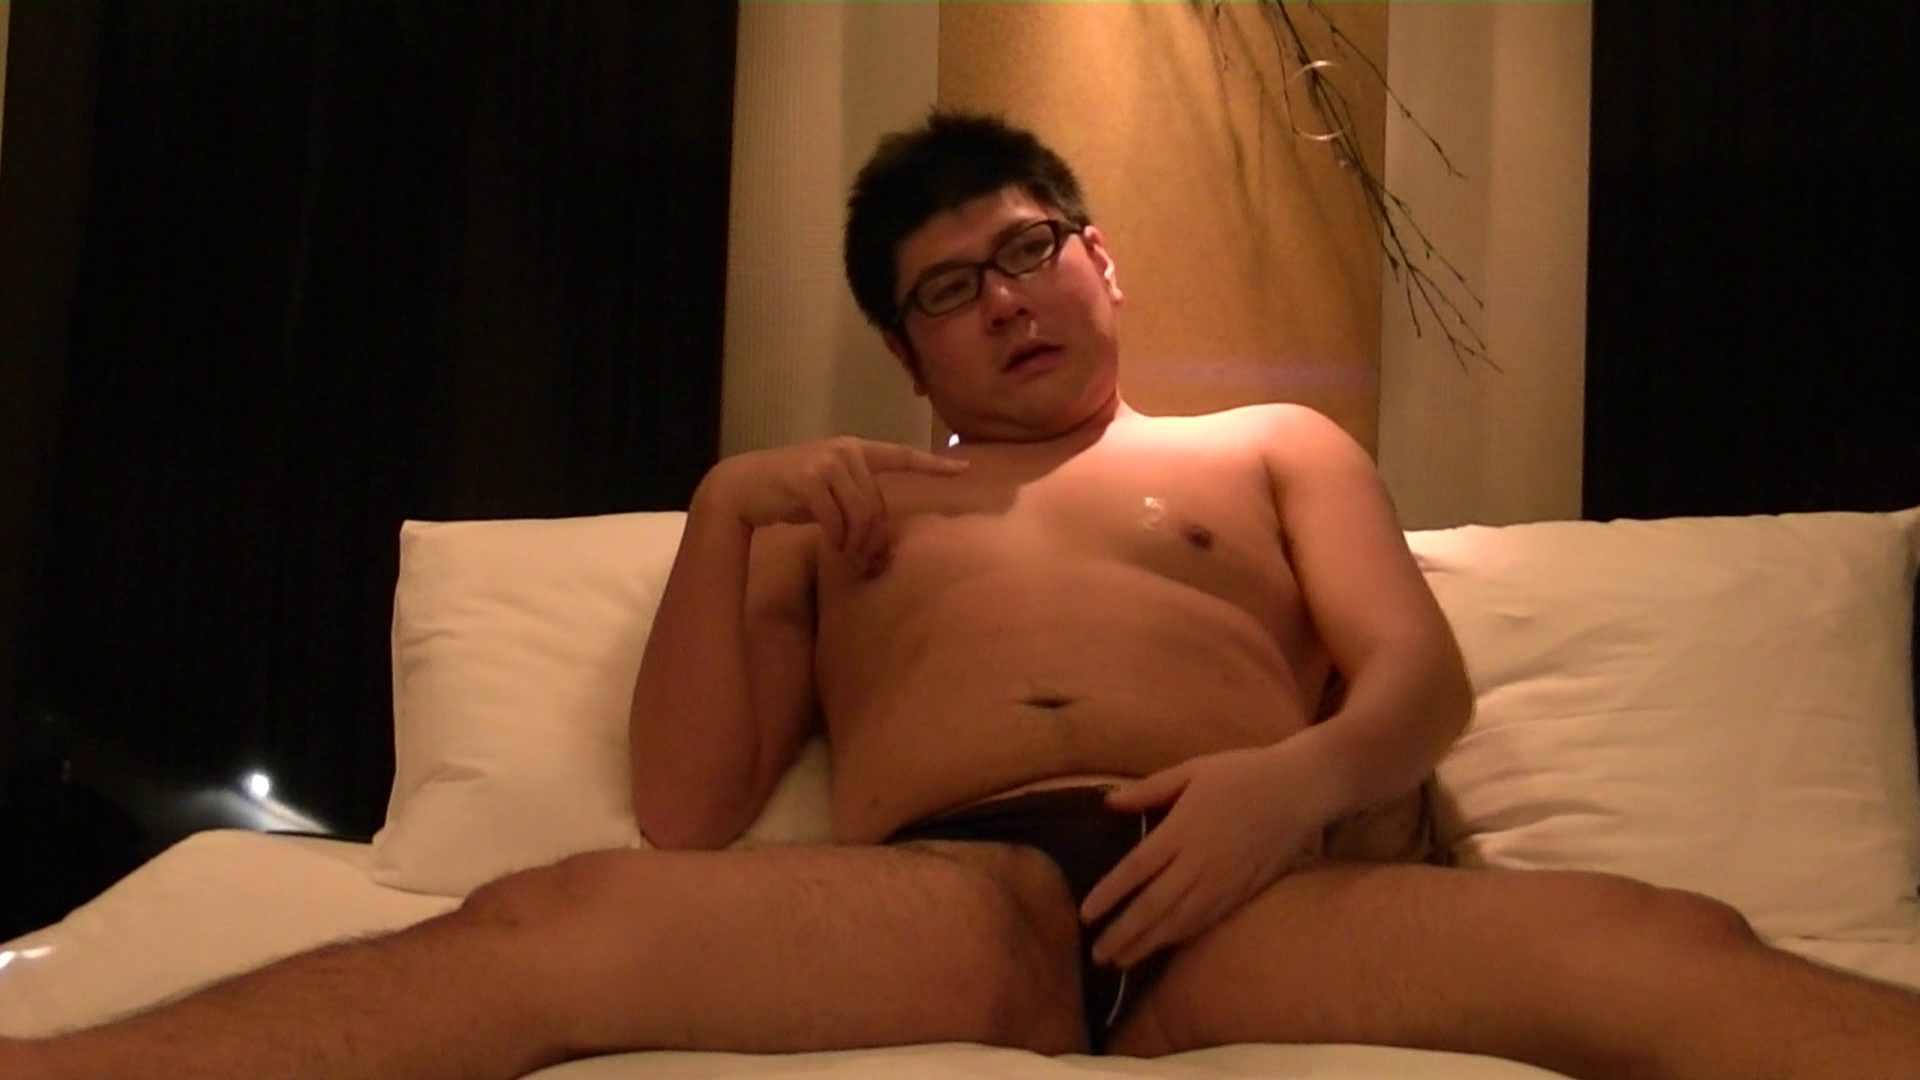 Mr.オナックスさん投稿!HD 貴方のオナニー三万円で撮影させてください。VOL.02 前編 投稿シリーズ ゲイアダルトビデオ画像 105連発 54